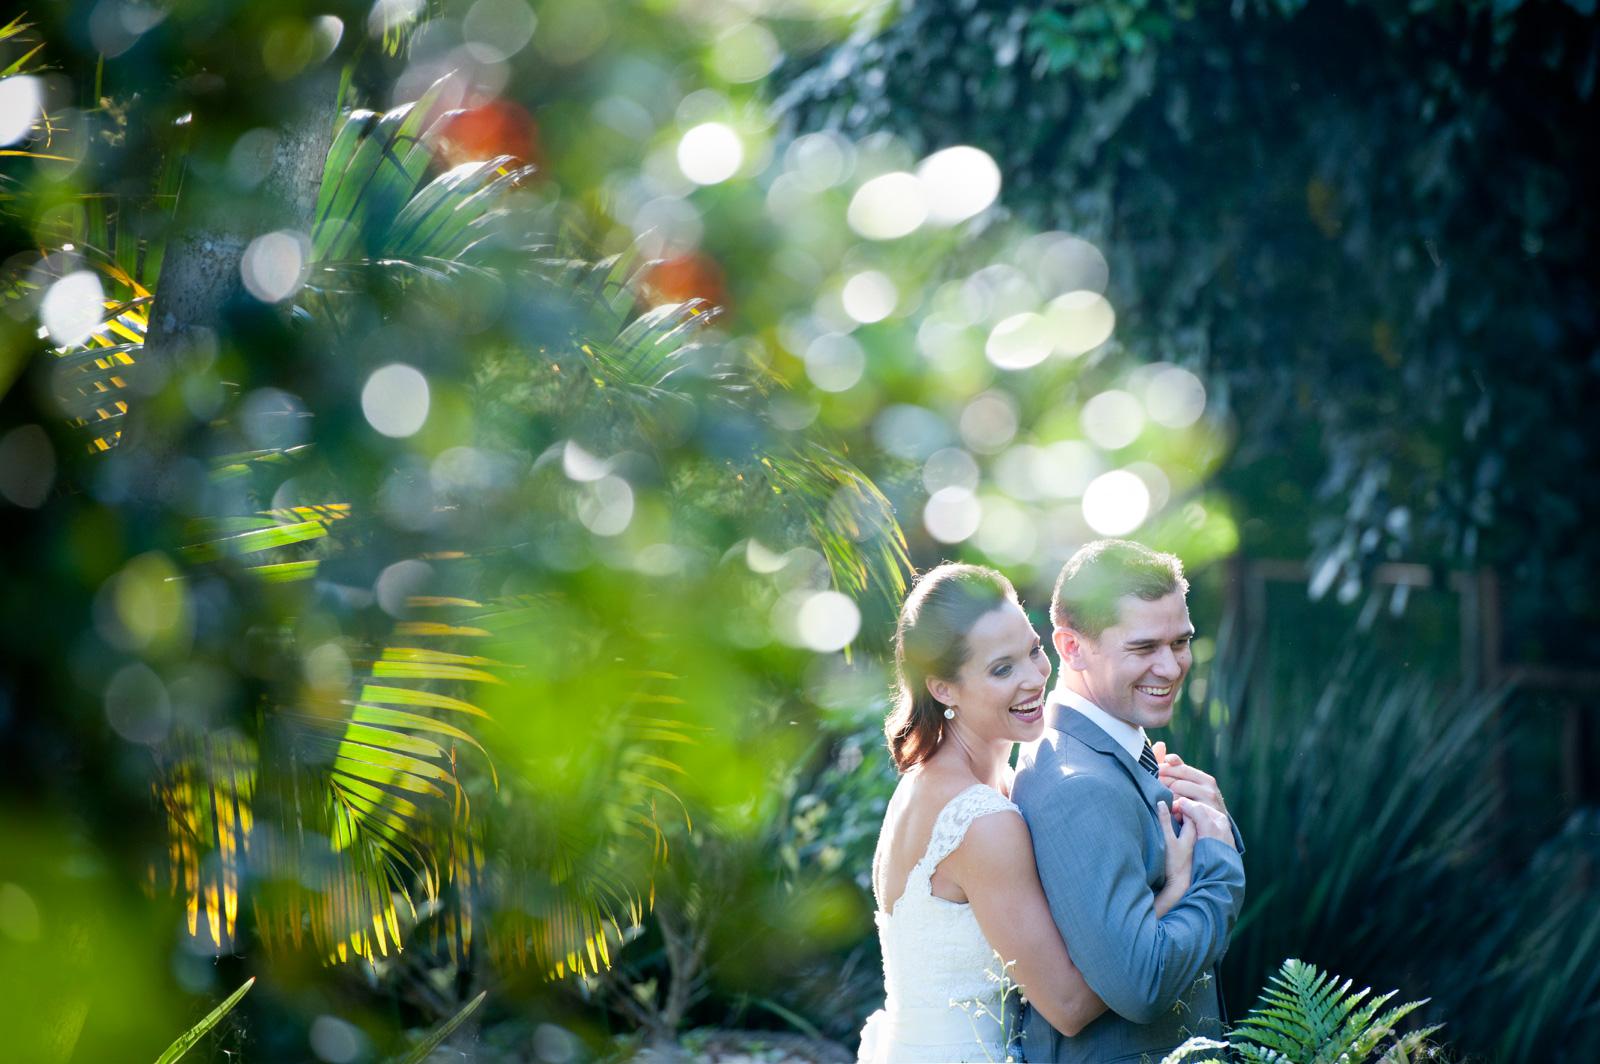 Talloula Documentary Wedding Photography Couple Creative Shoot